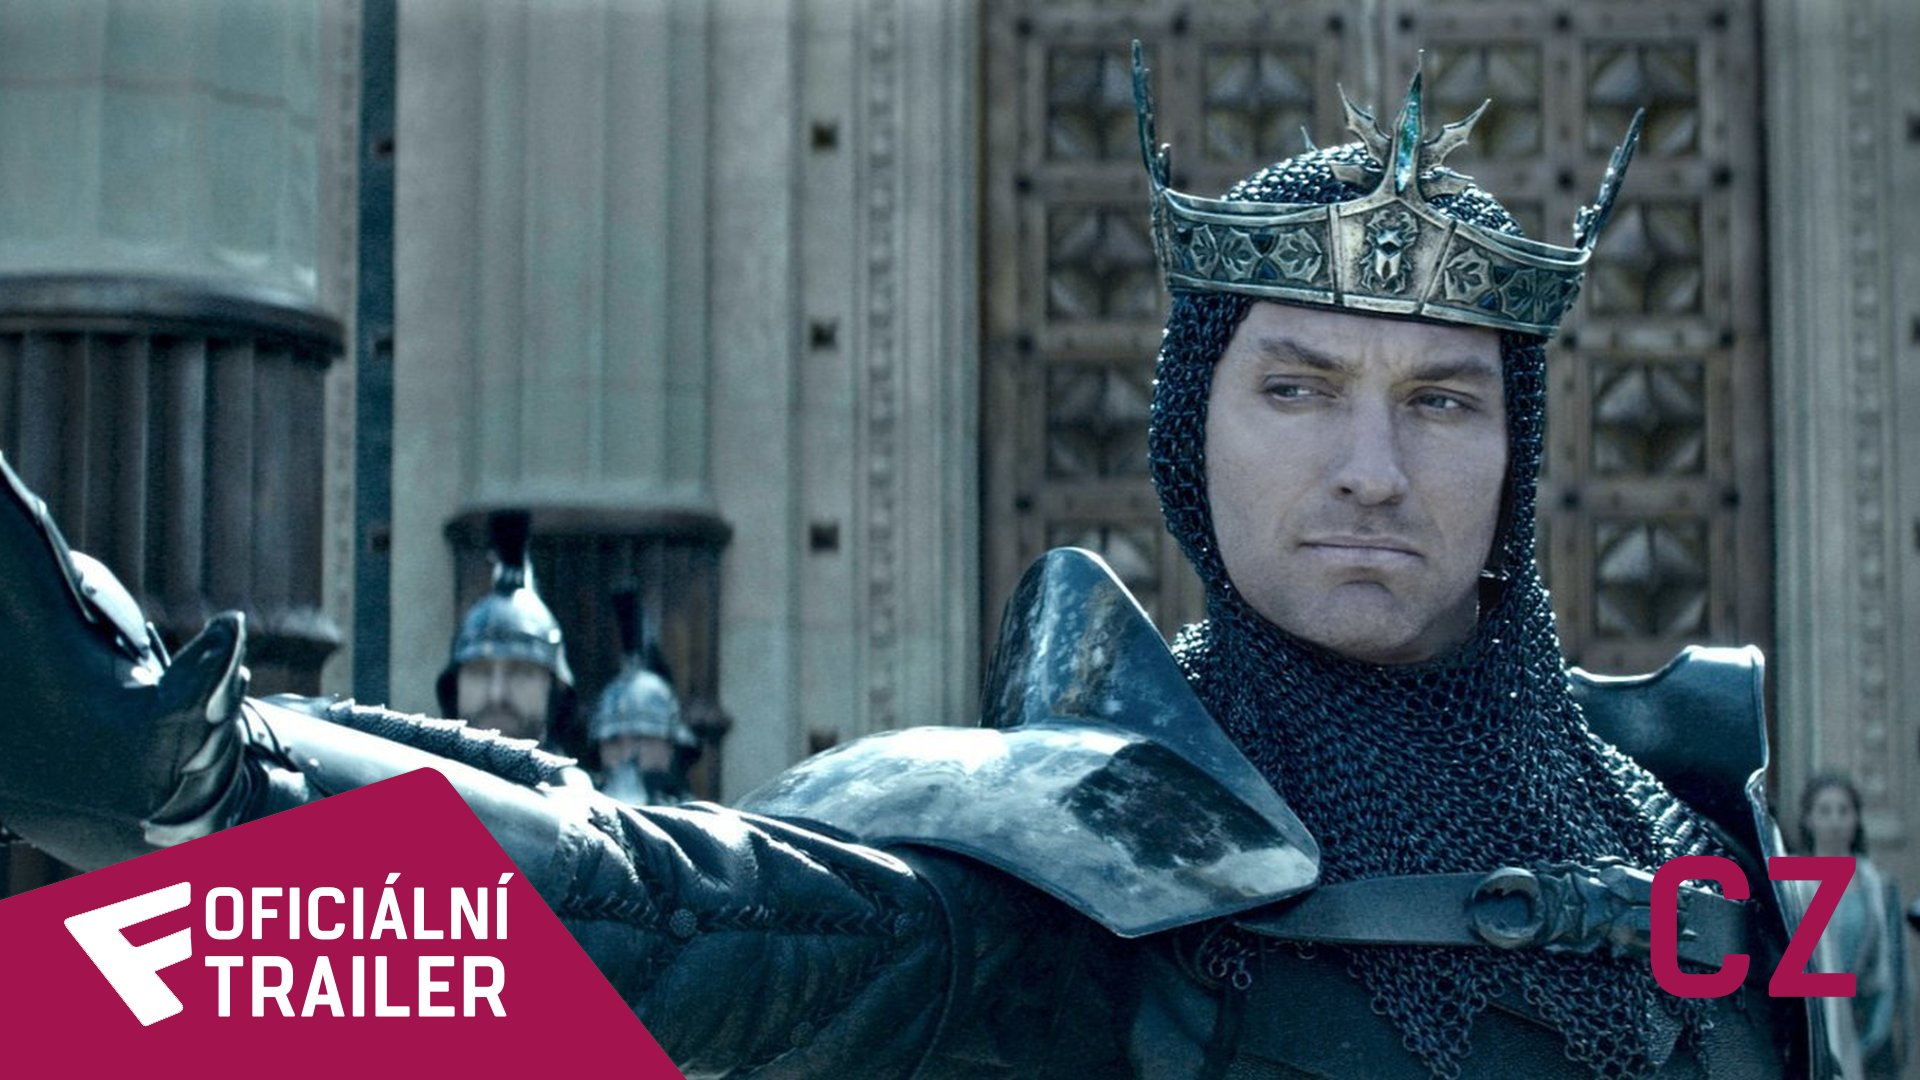 Král Artuš: Legenda o meči - Oficiální Trailer (CZ) | Fandíme filmu